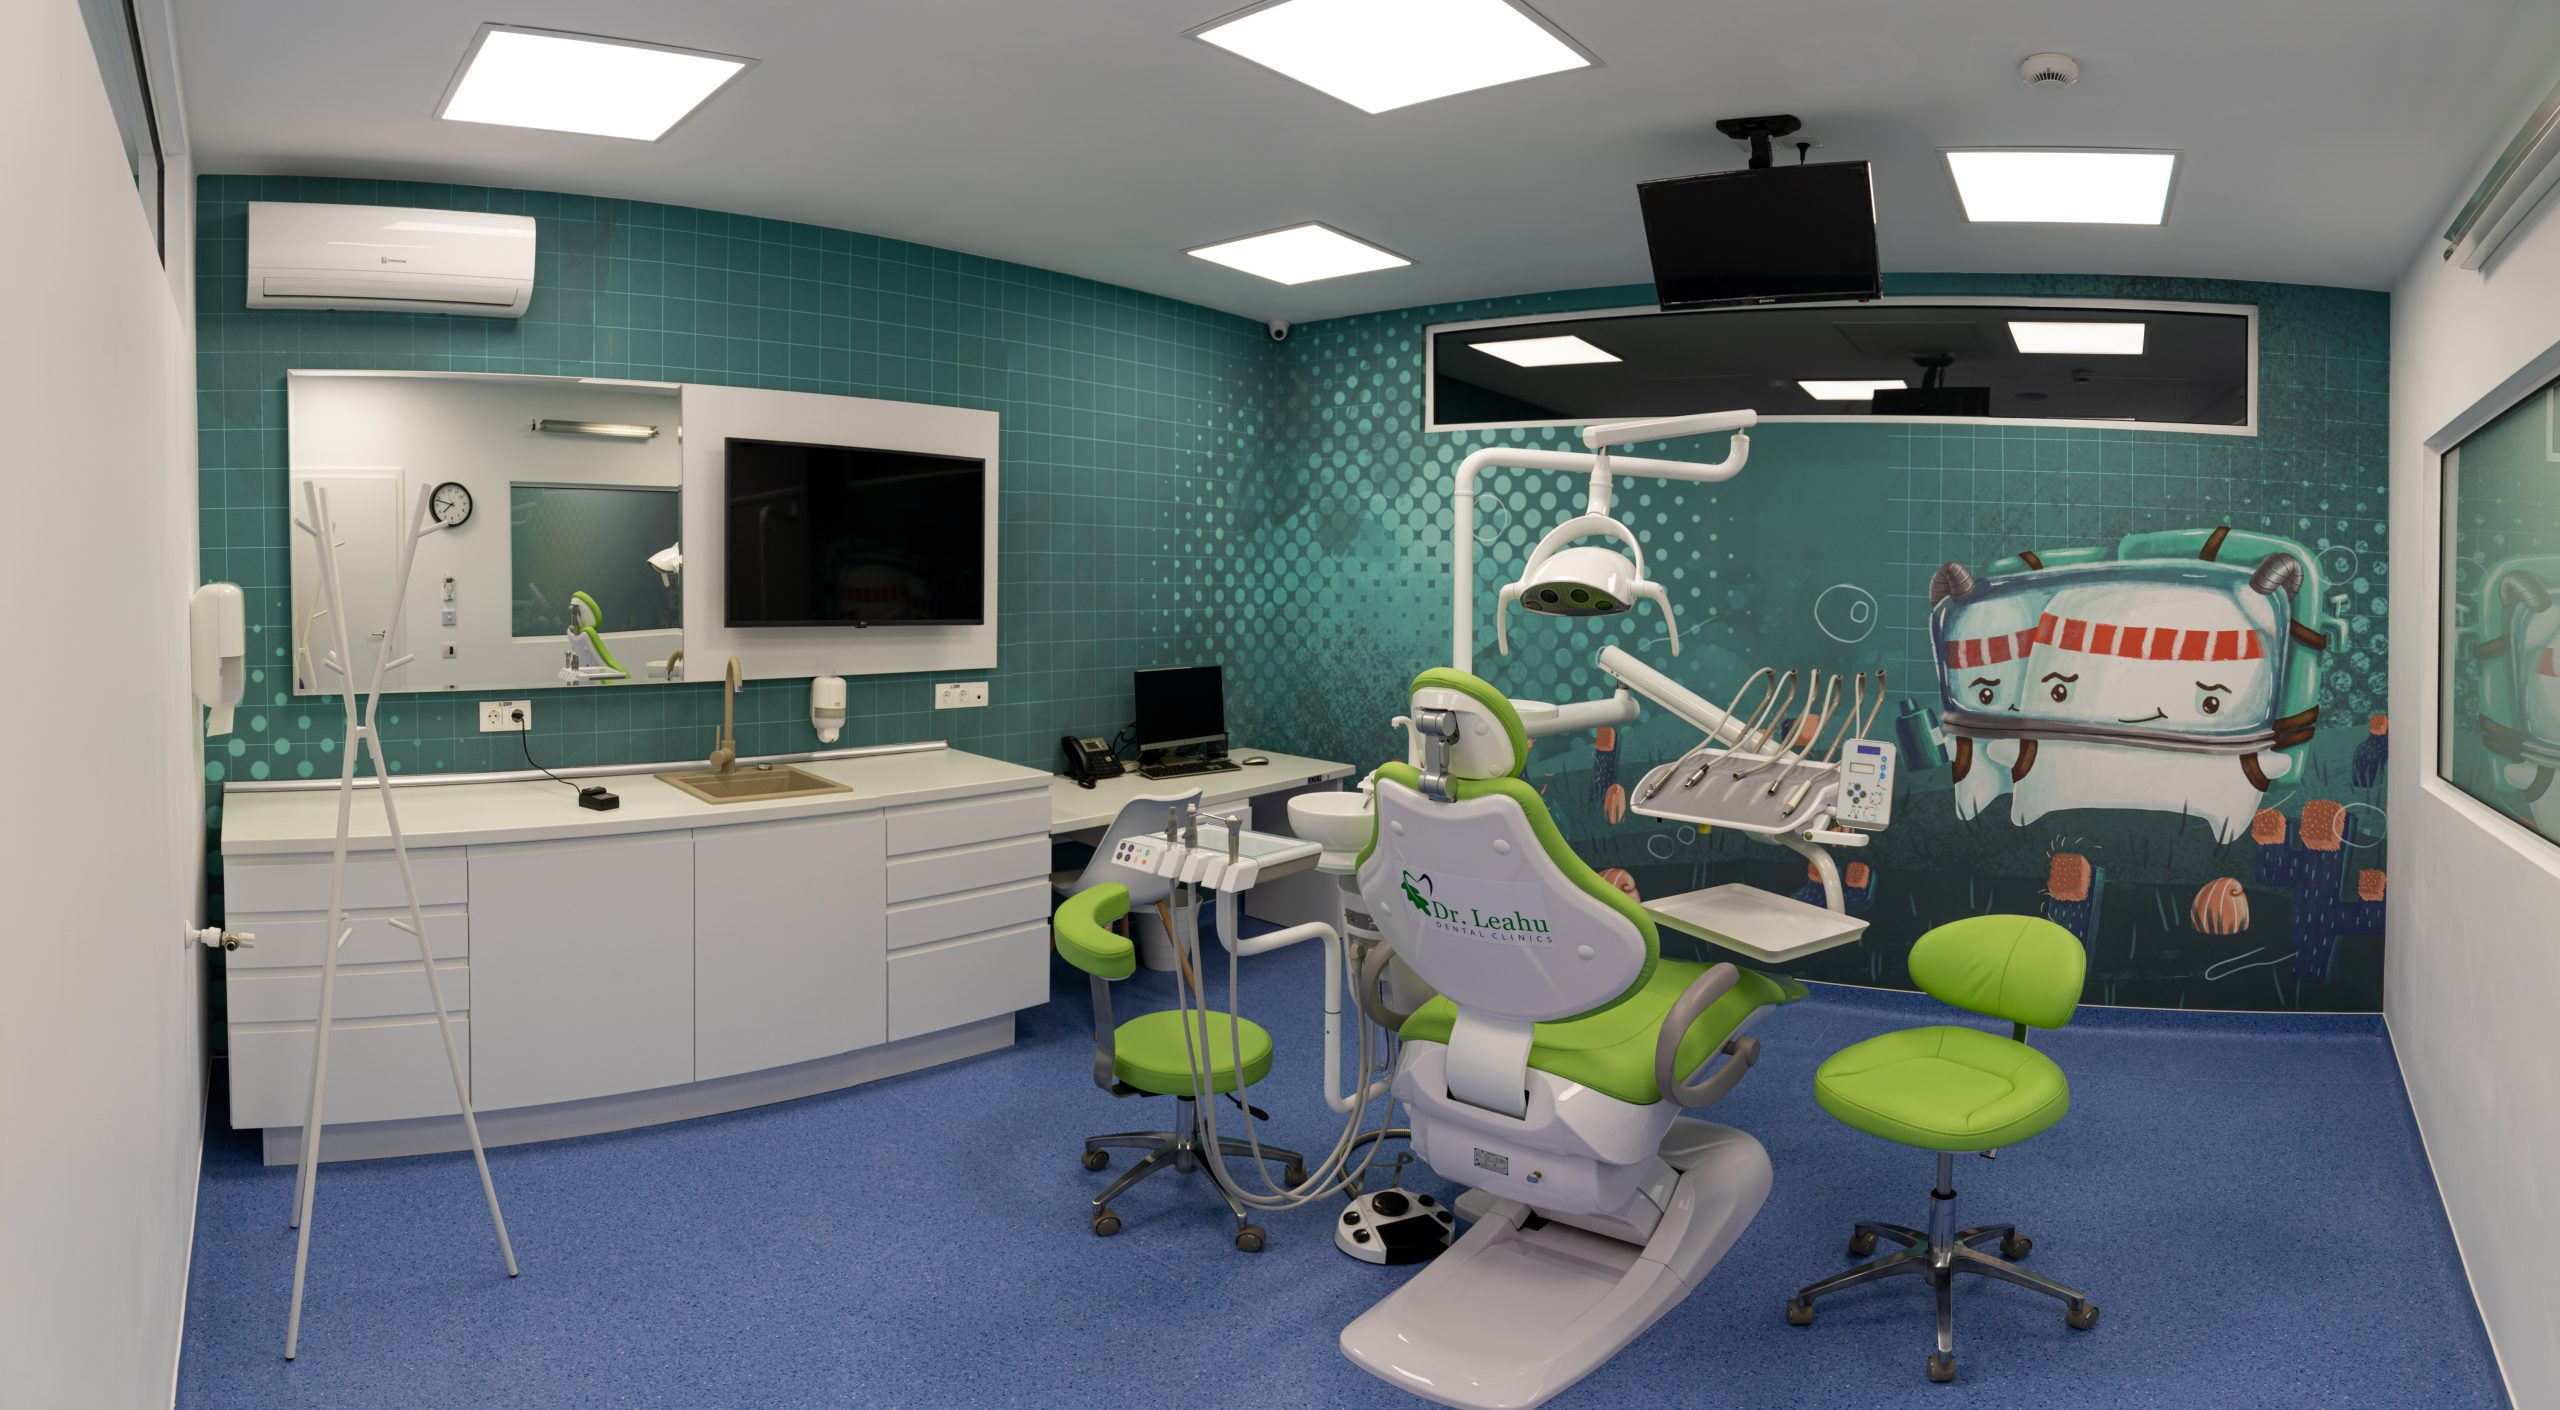 cabinet stomatologic copii Dr. Leahu Ploiesti